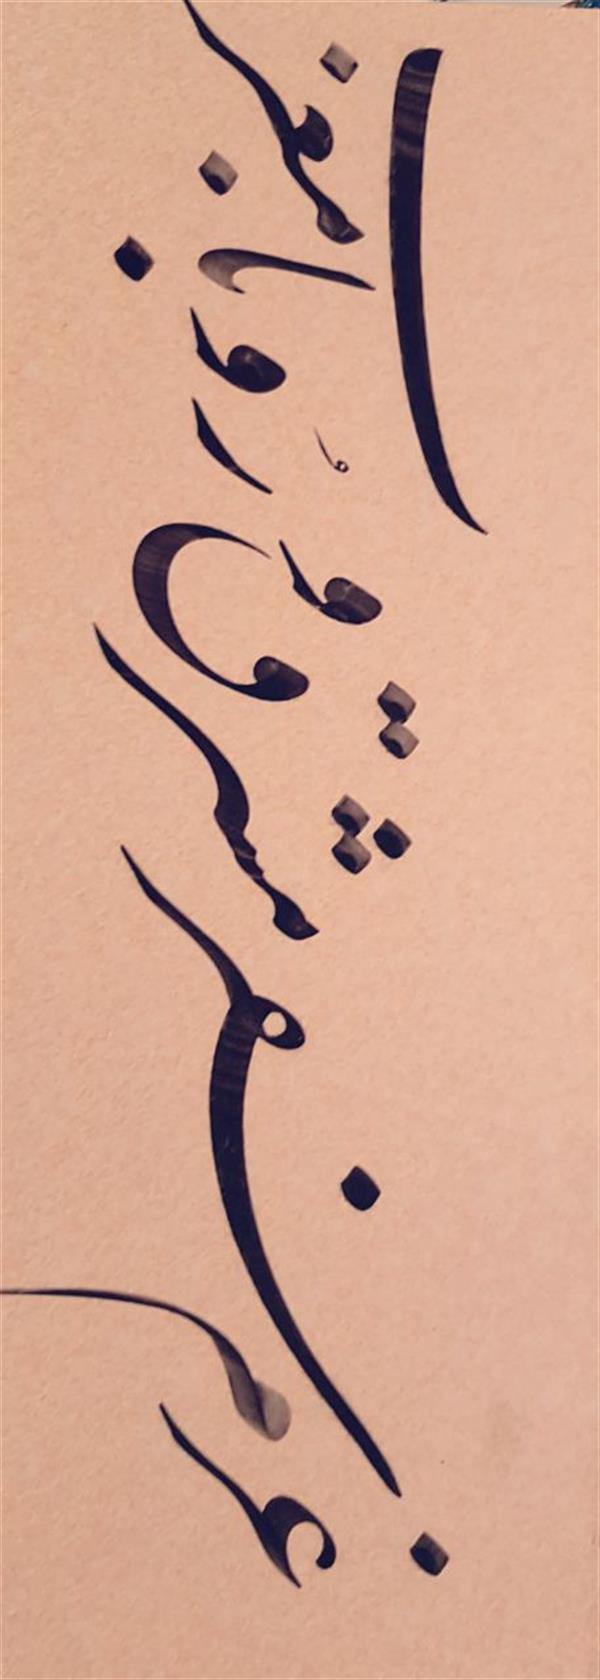 هنر خوشنویسی محفل خوشنویسی علیرضاعبادی قطعه سطر ،قلم مشقی ،تاریخ تحریر۱۳۹۴